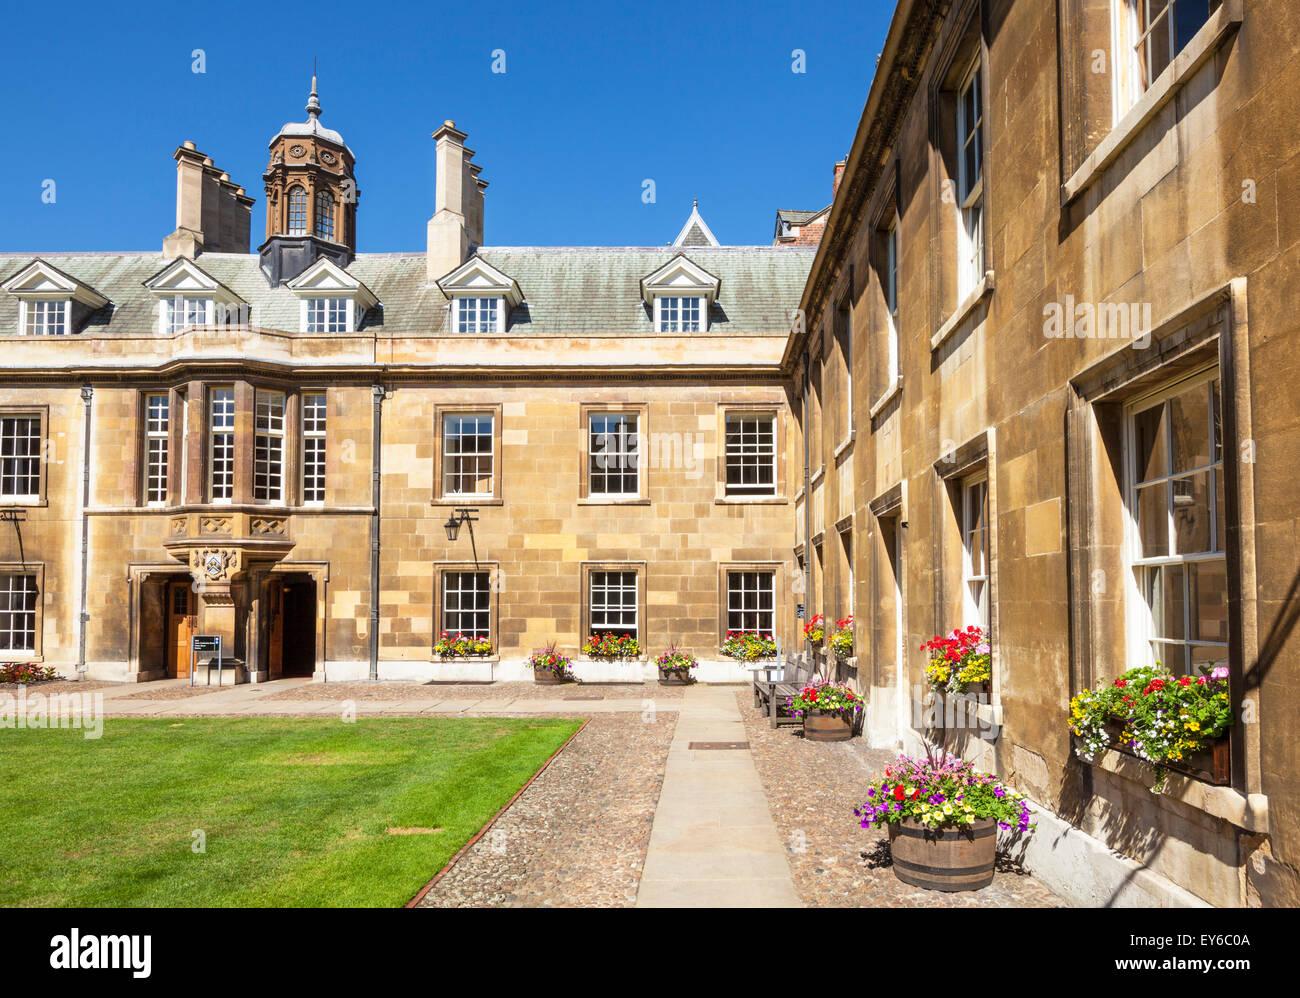 Gonville court at Gonville and Caius college Cambridge university Cambridge Cambridgeshire England UK GB EU Europe - Stock Image